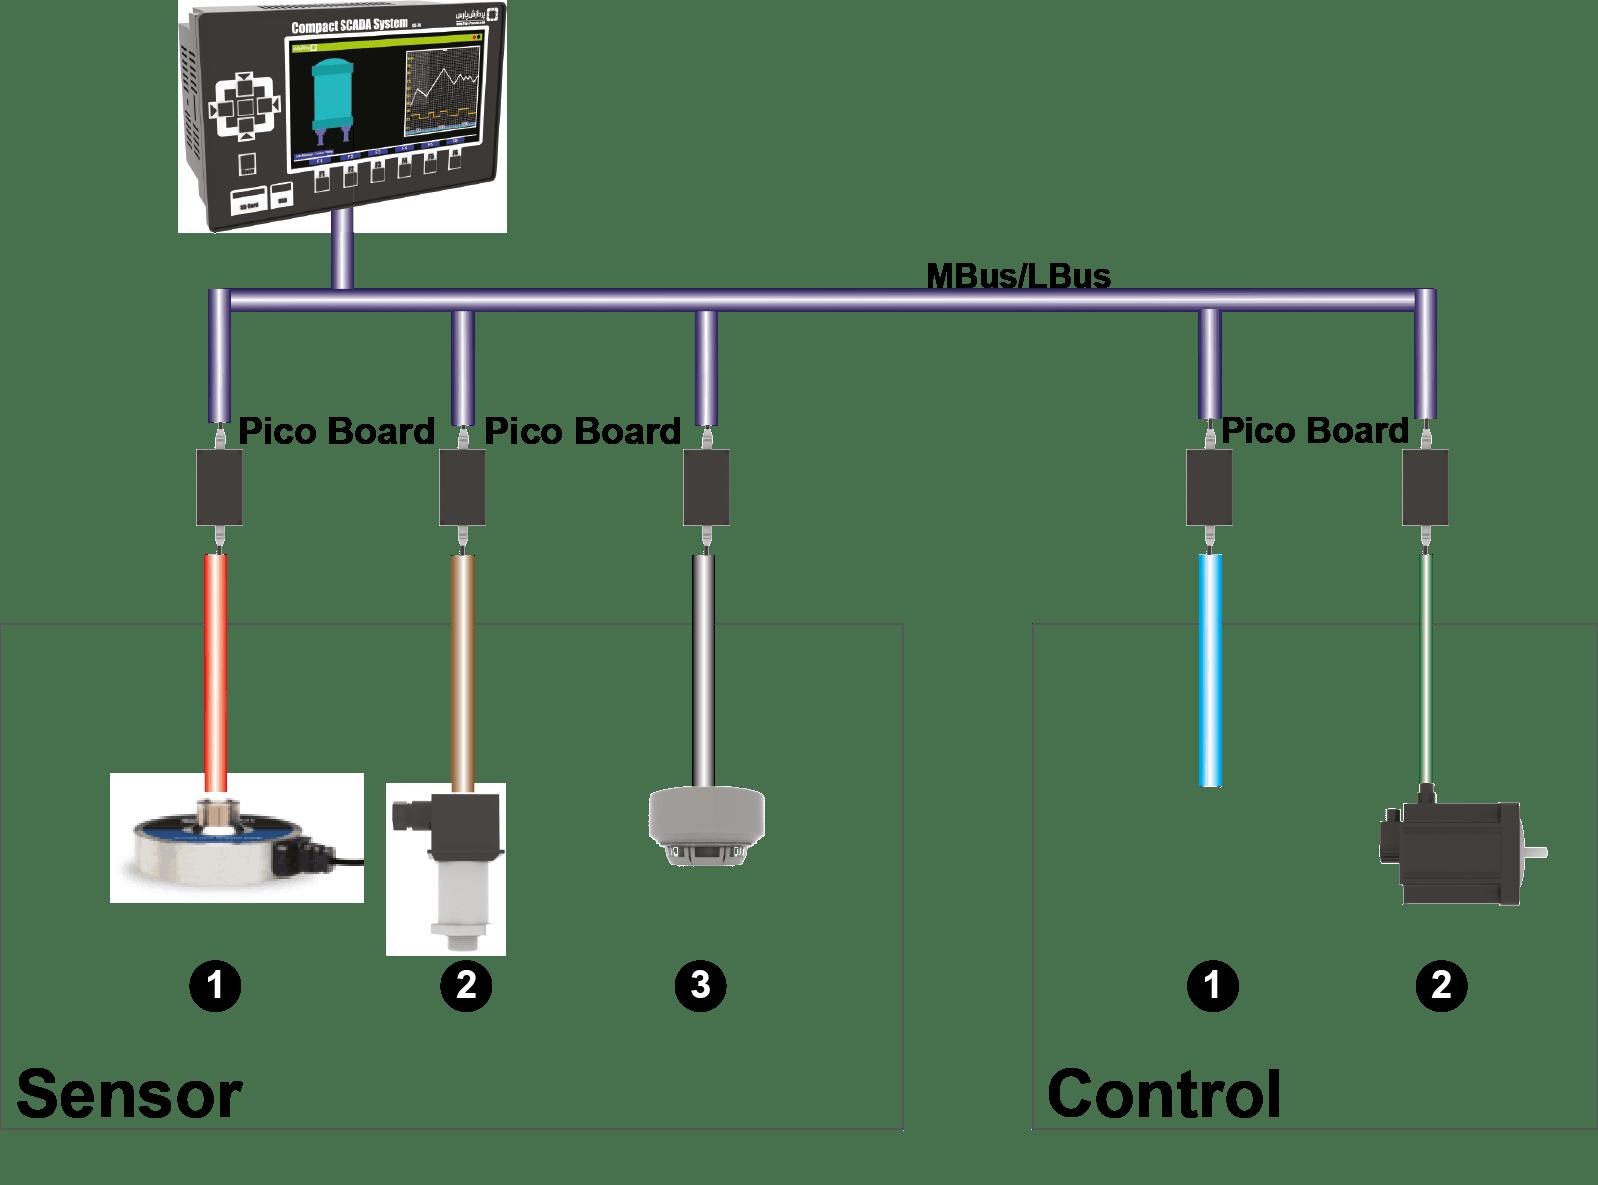 Picasso Towbar Wiring Diagram : Wiring diagram for citroen xsara picasso towbar gallery